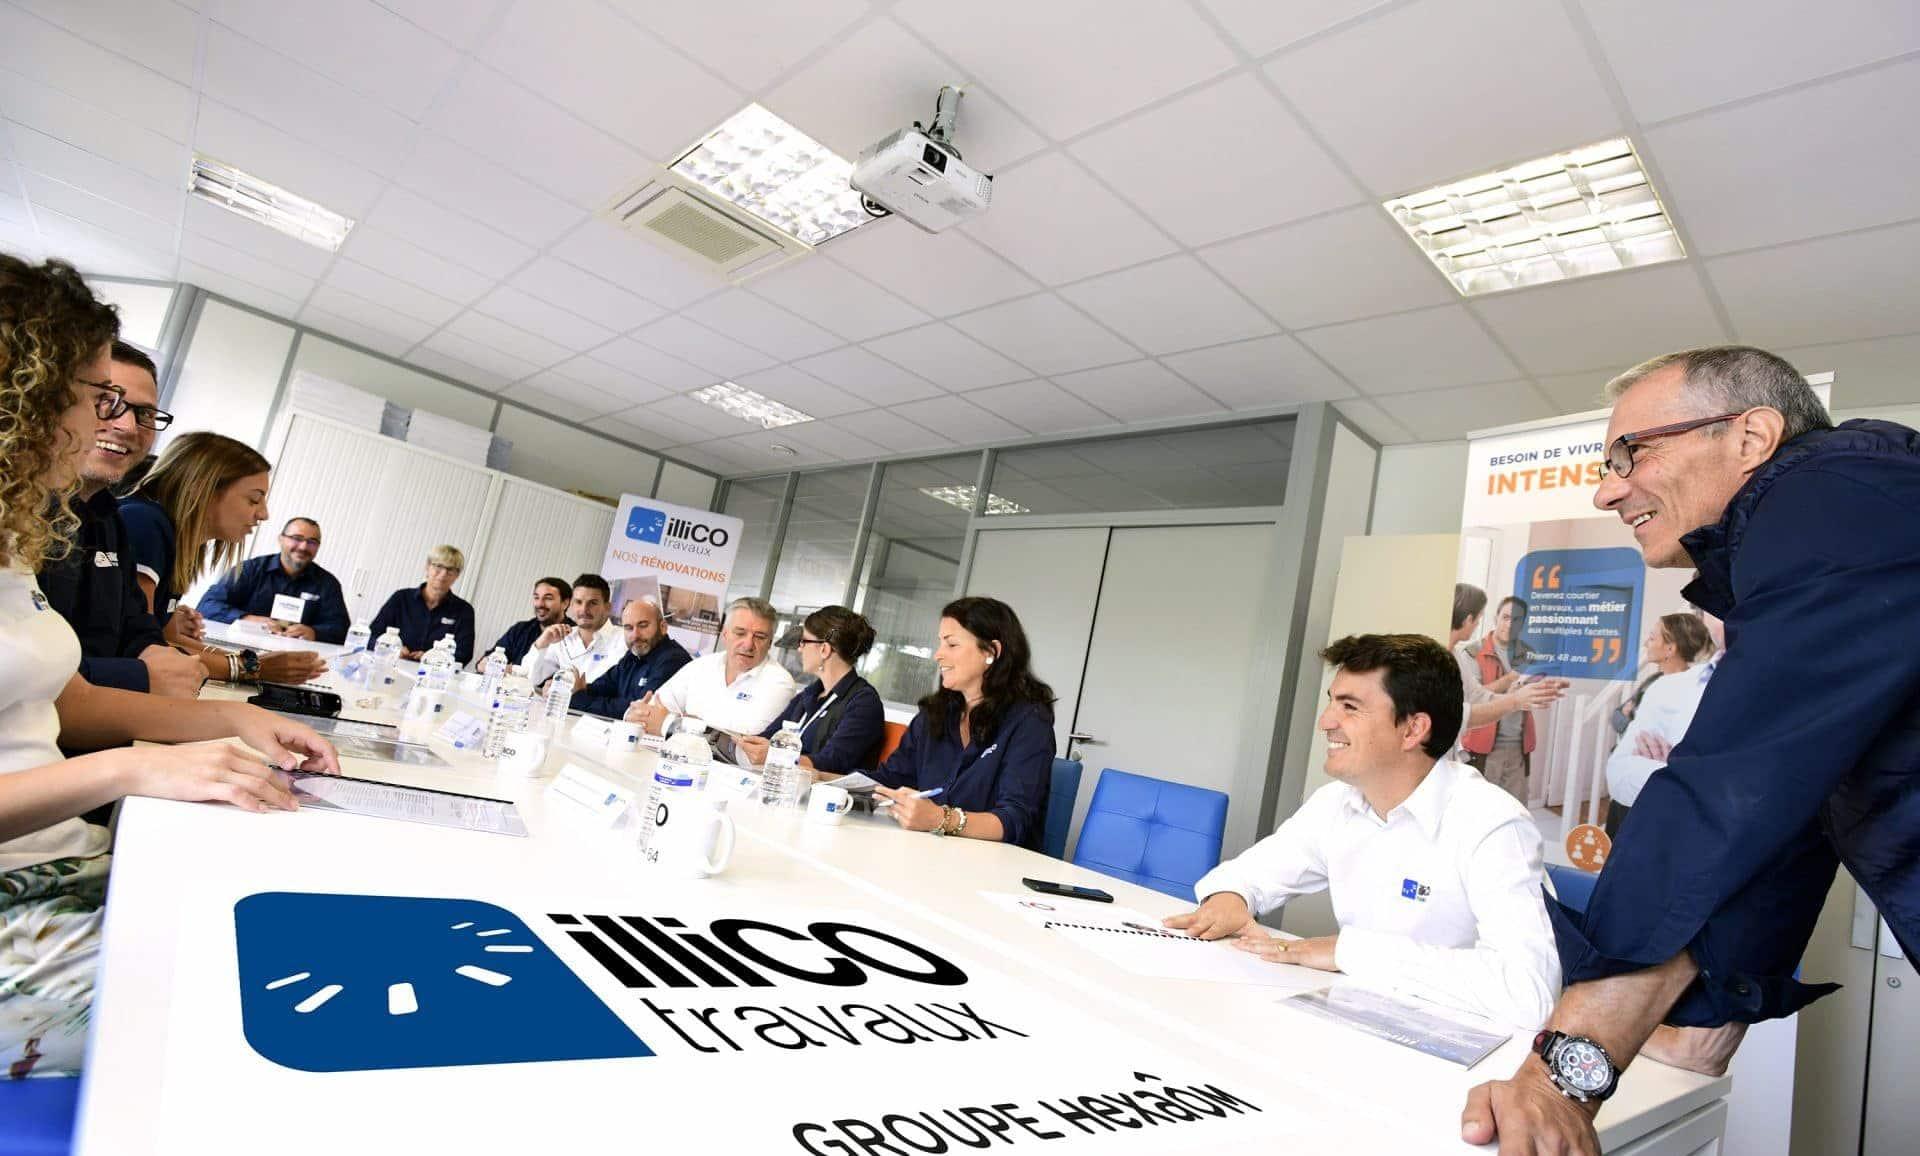 Tournage Figaro Classifieds pour illiCO travaux